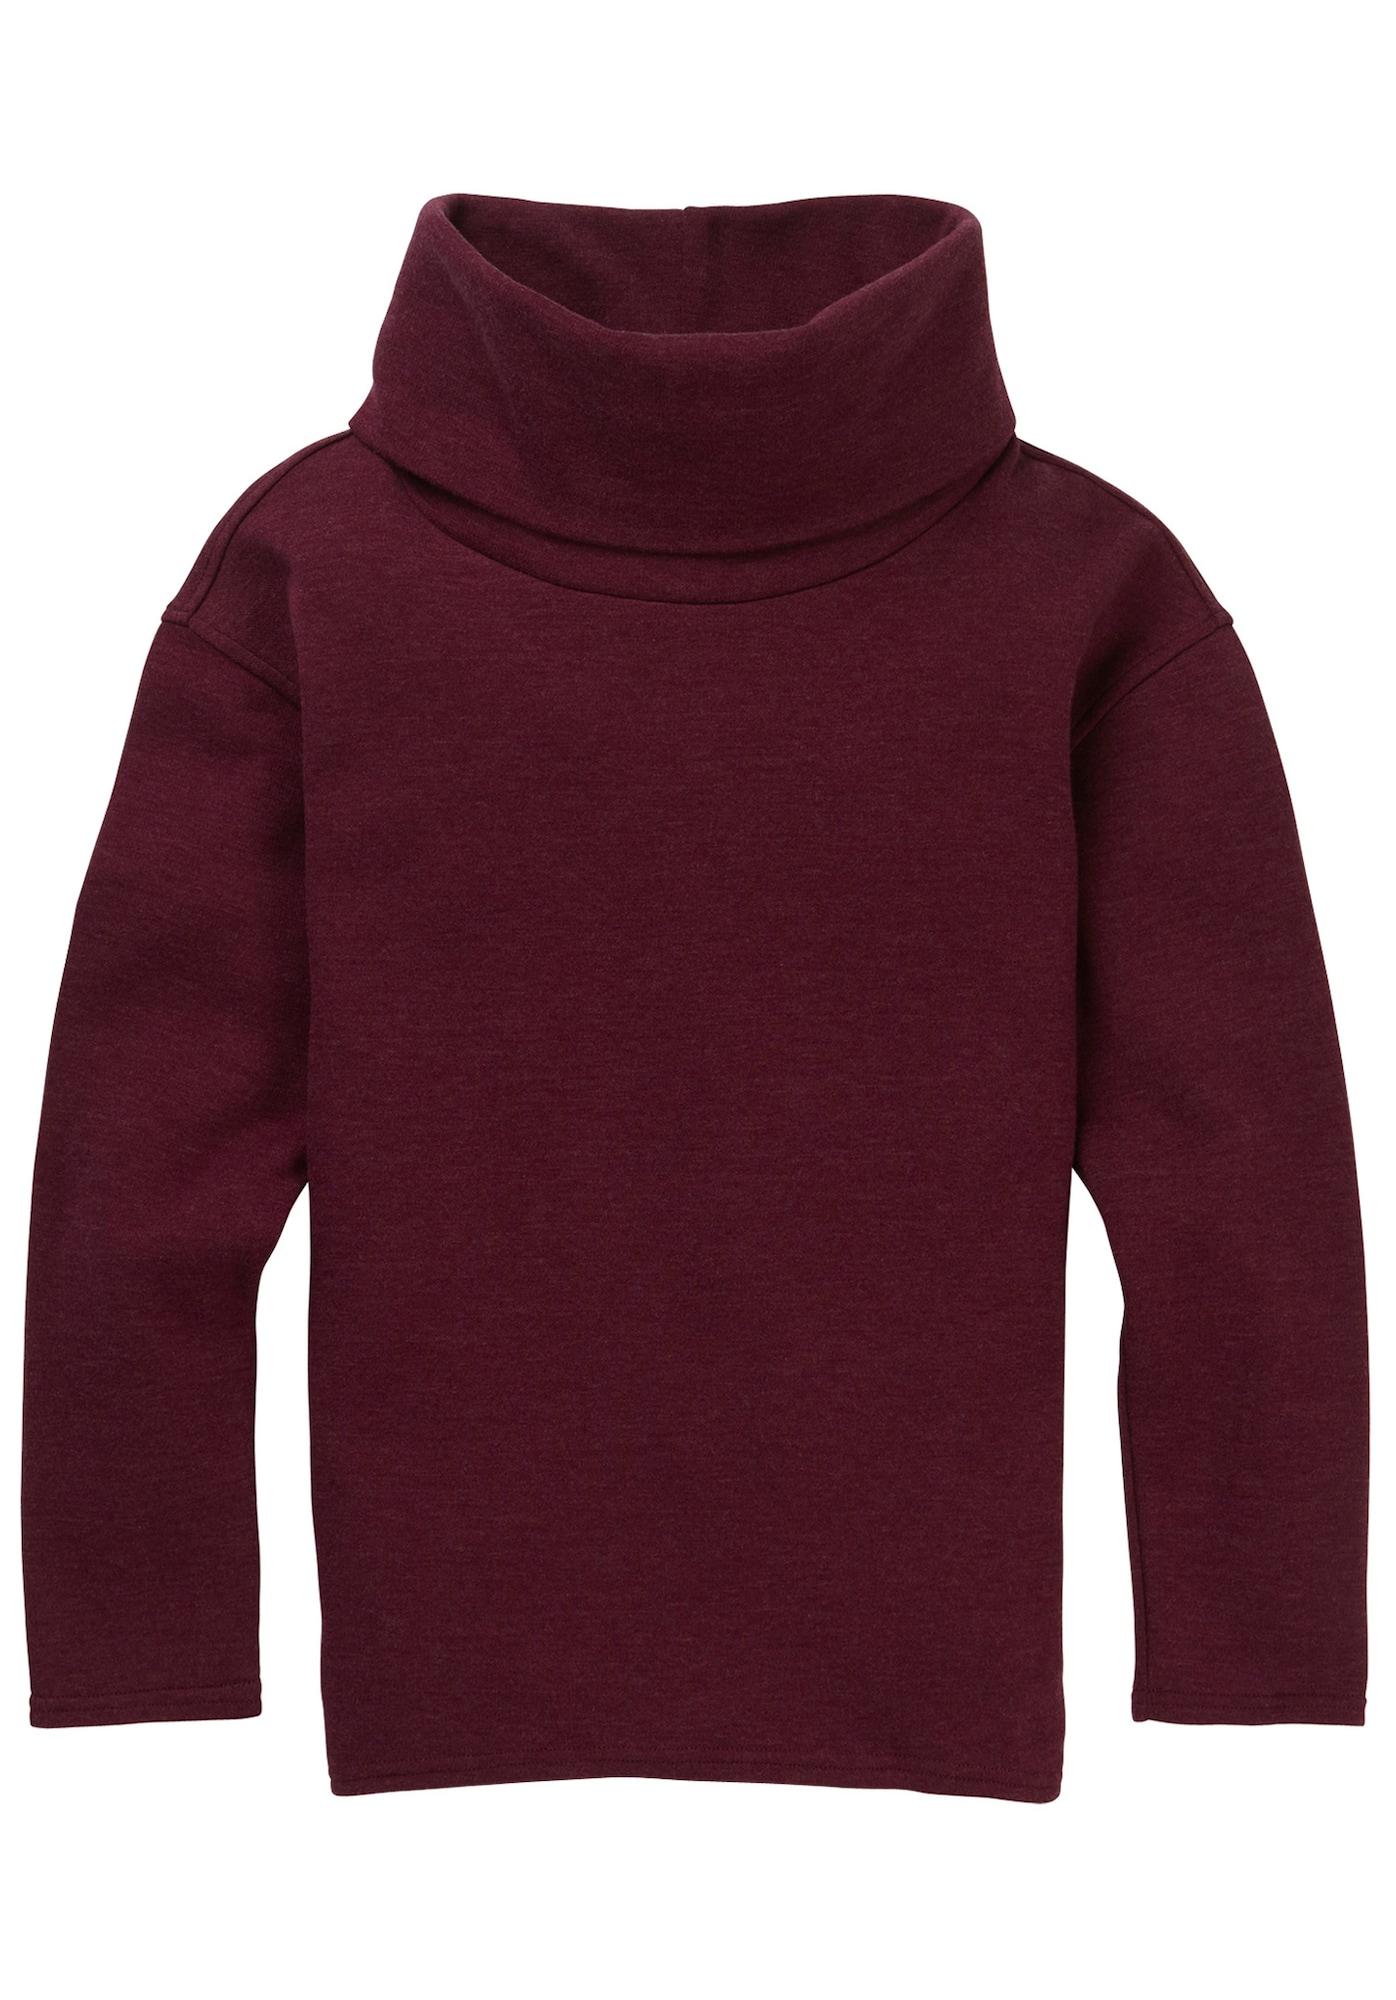 BURTON, Dames Sweatshirt 'Ellmore', kersrood